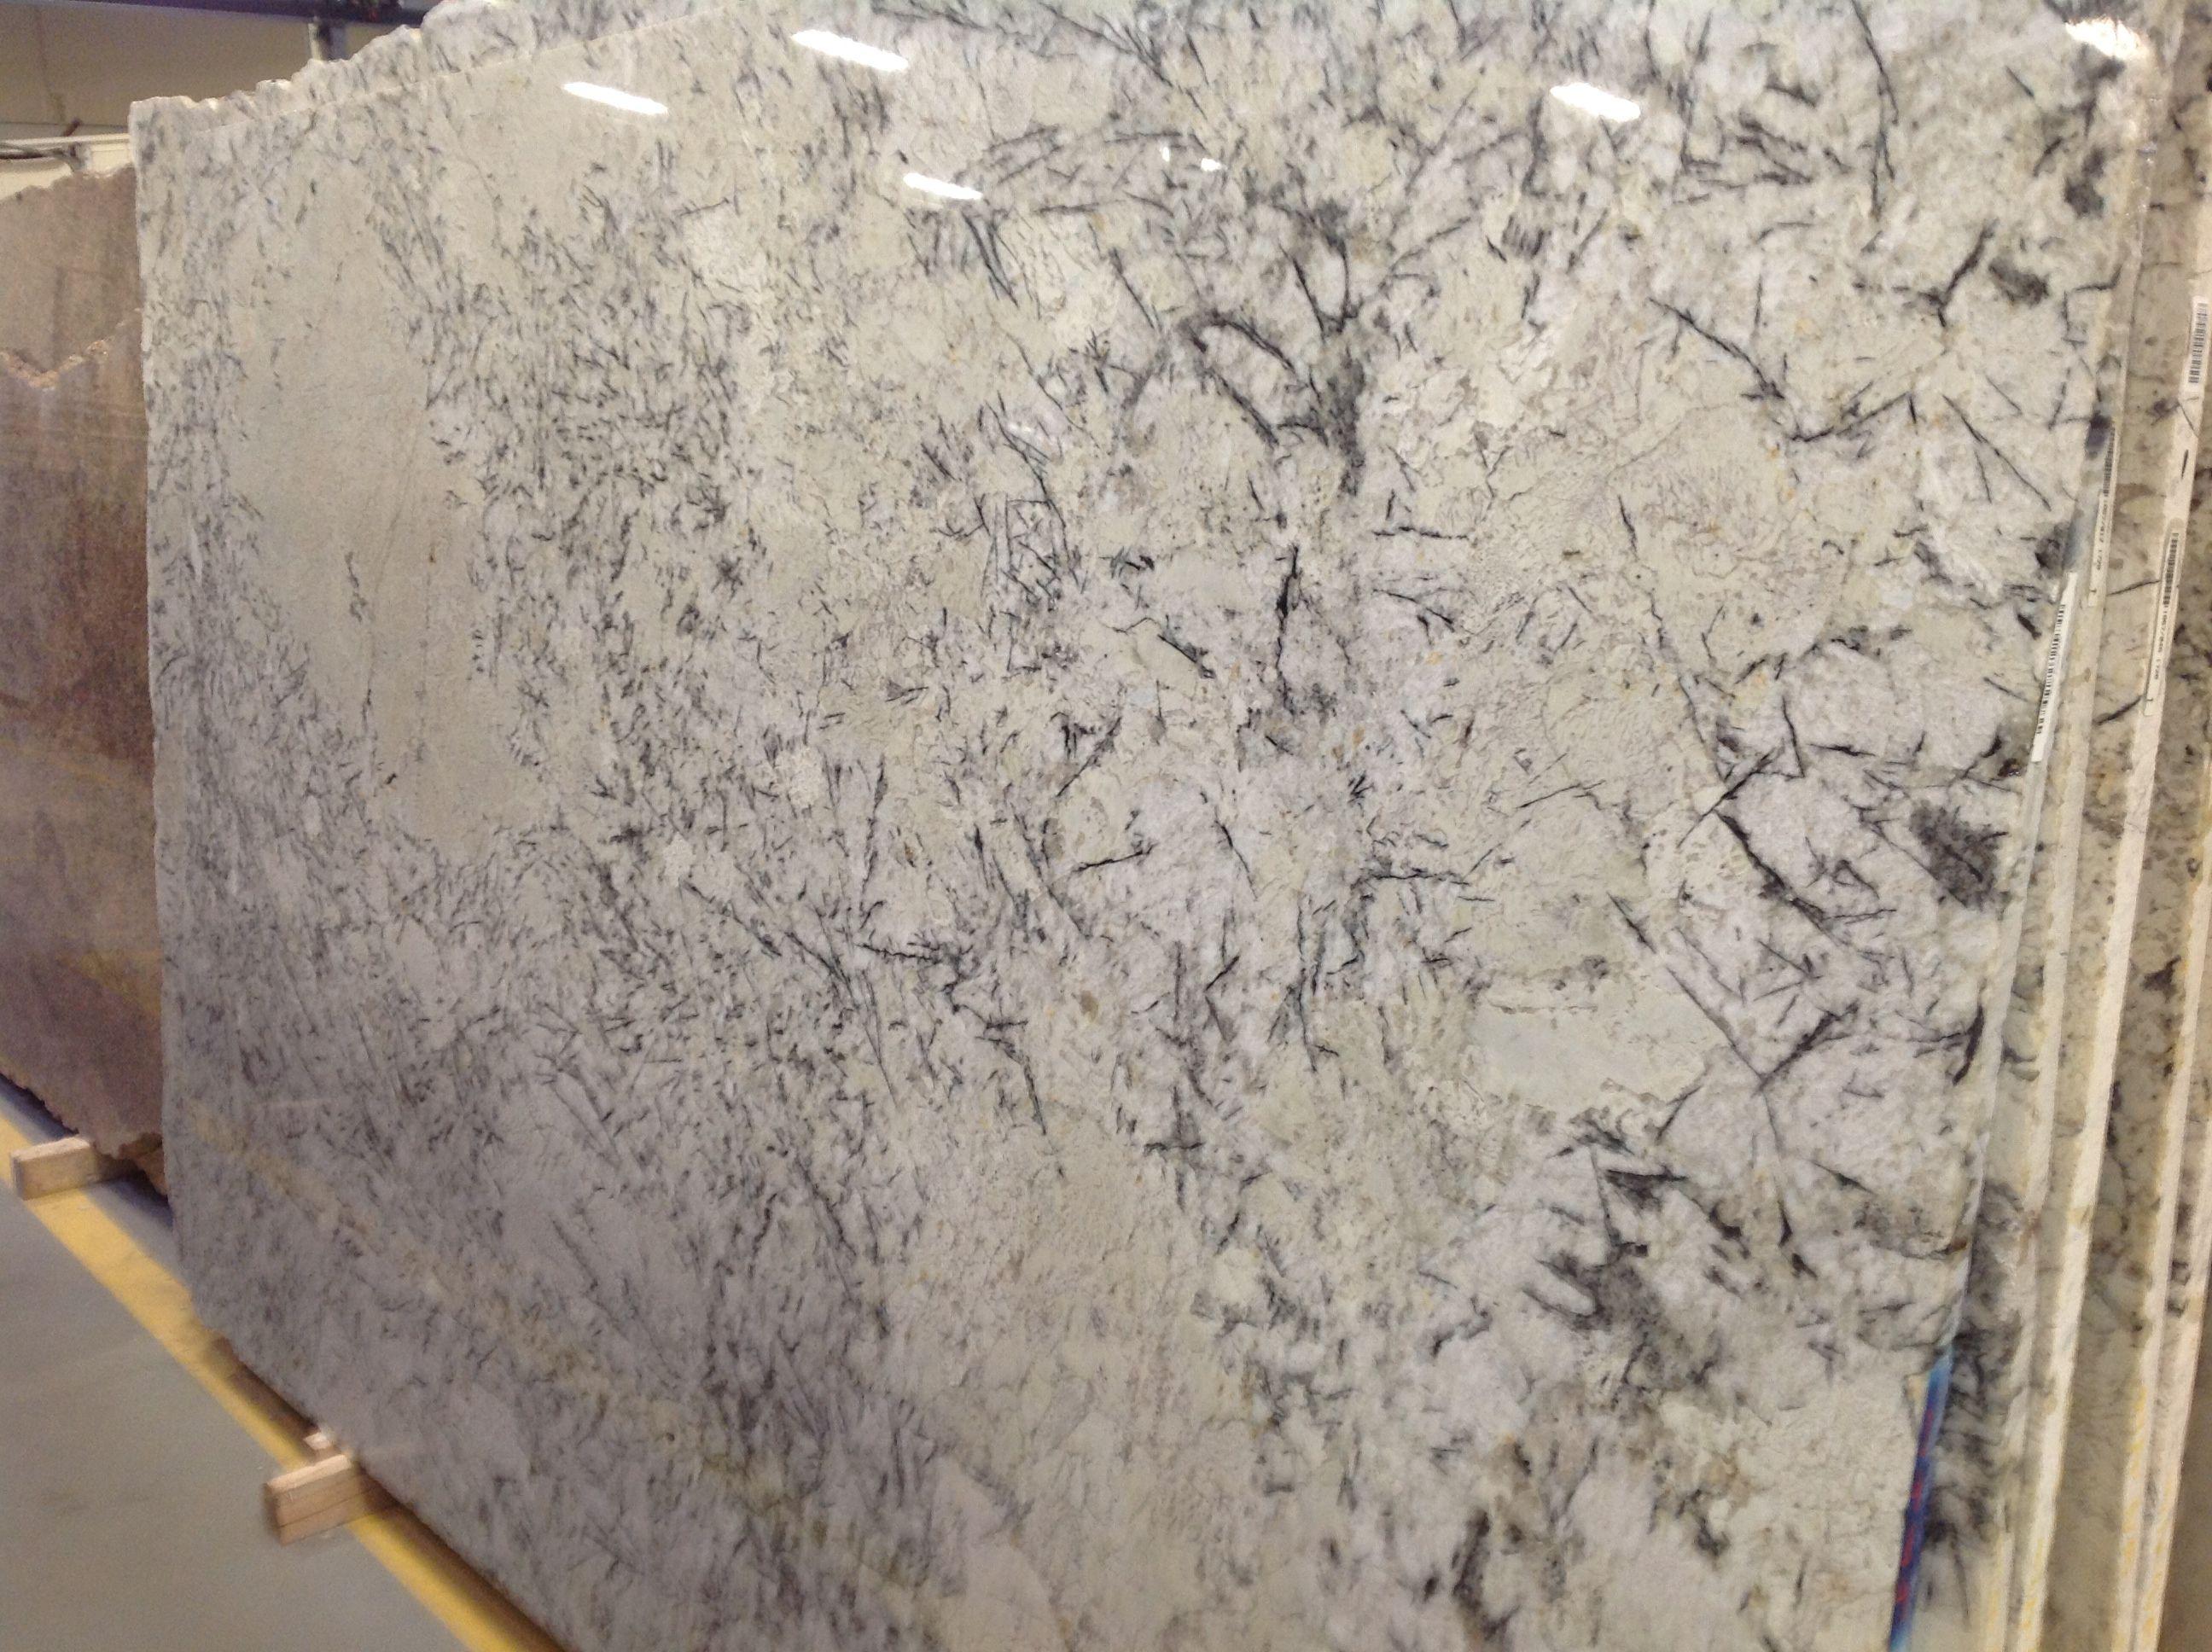 Https Ilsdus Files Wordpress Com 2014 03 Delicatusice Jpg Delicatus Granite Countertop Design Granite